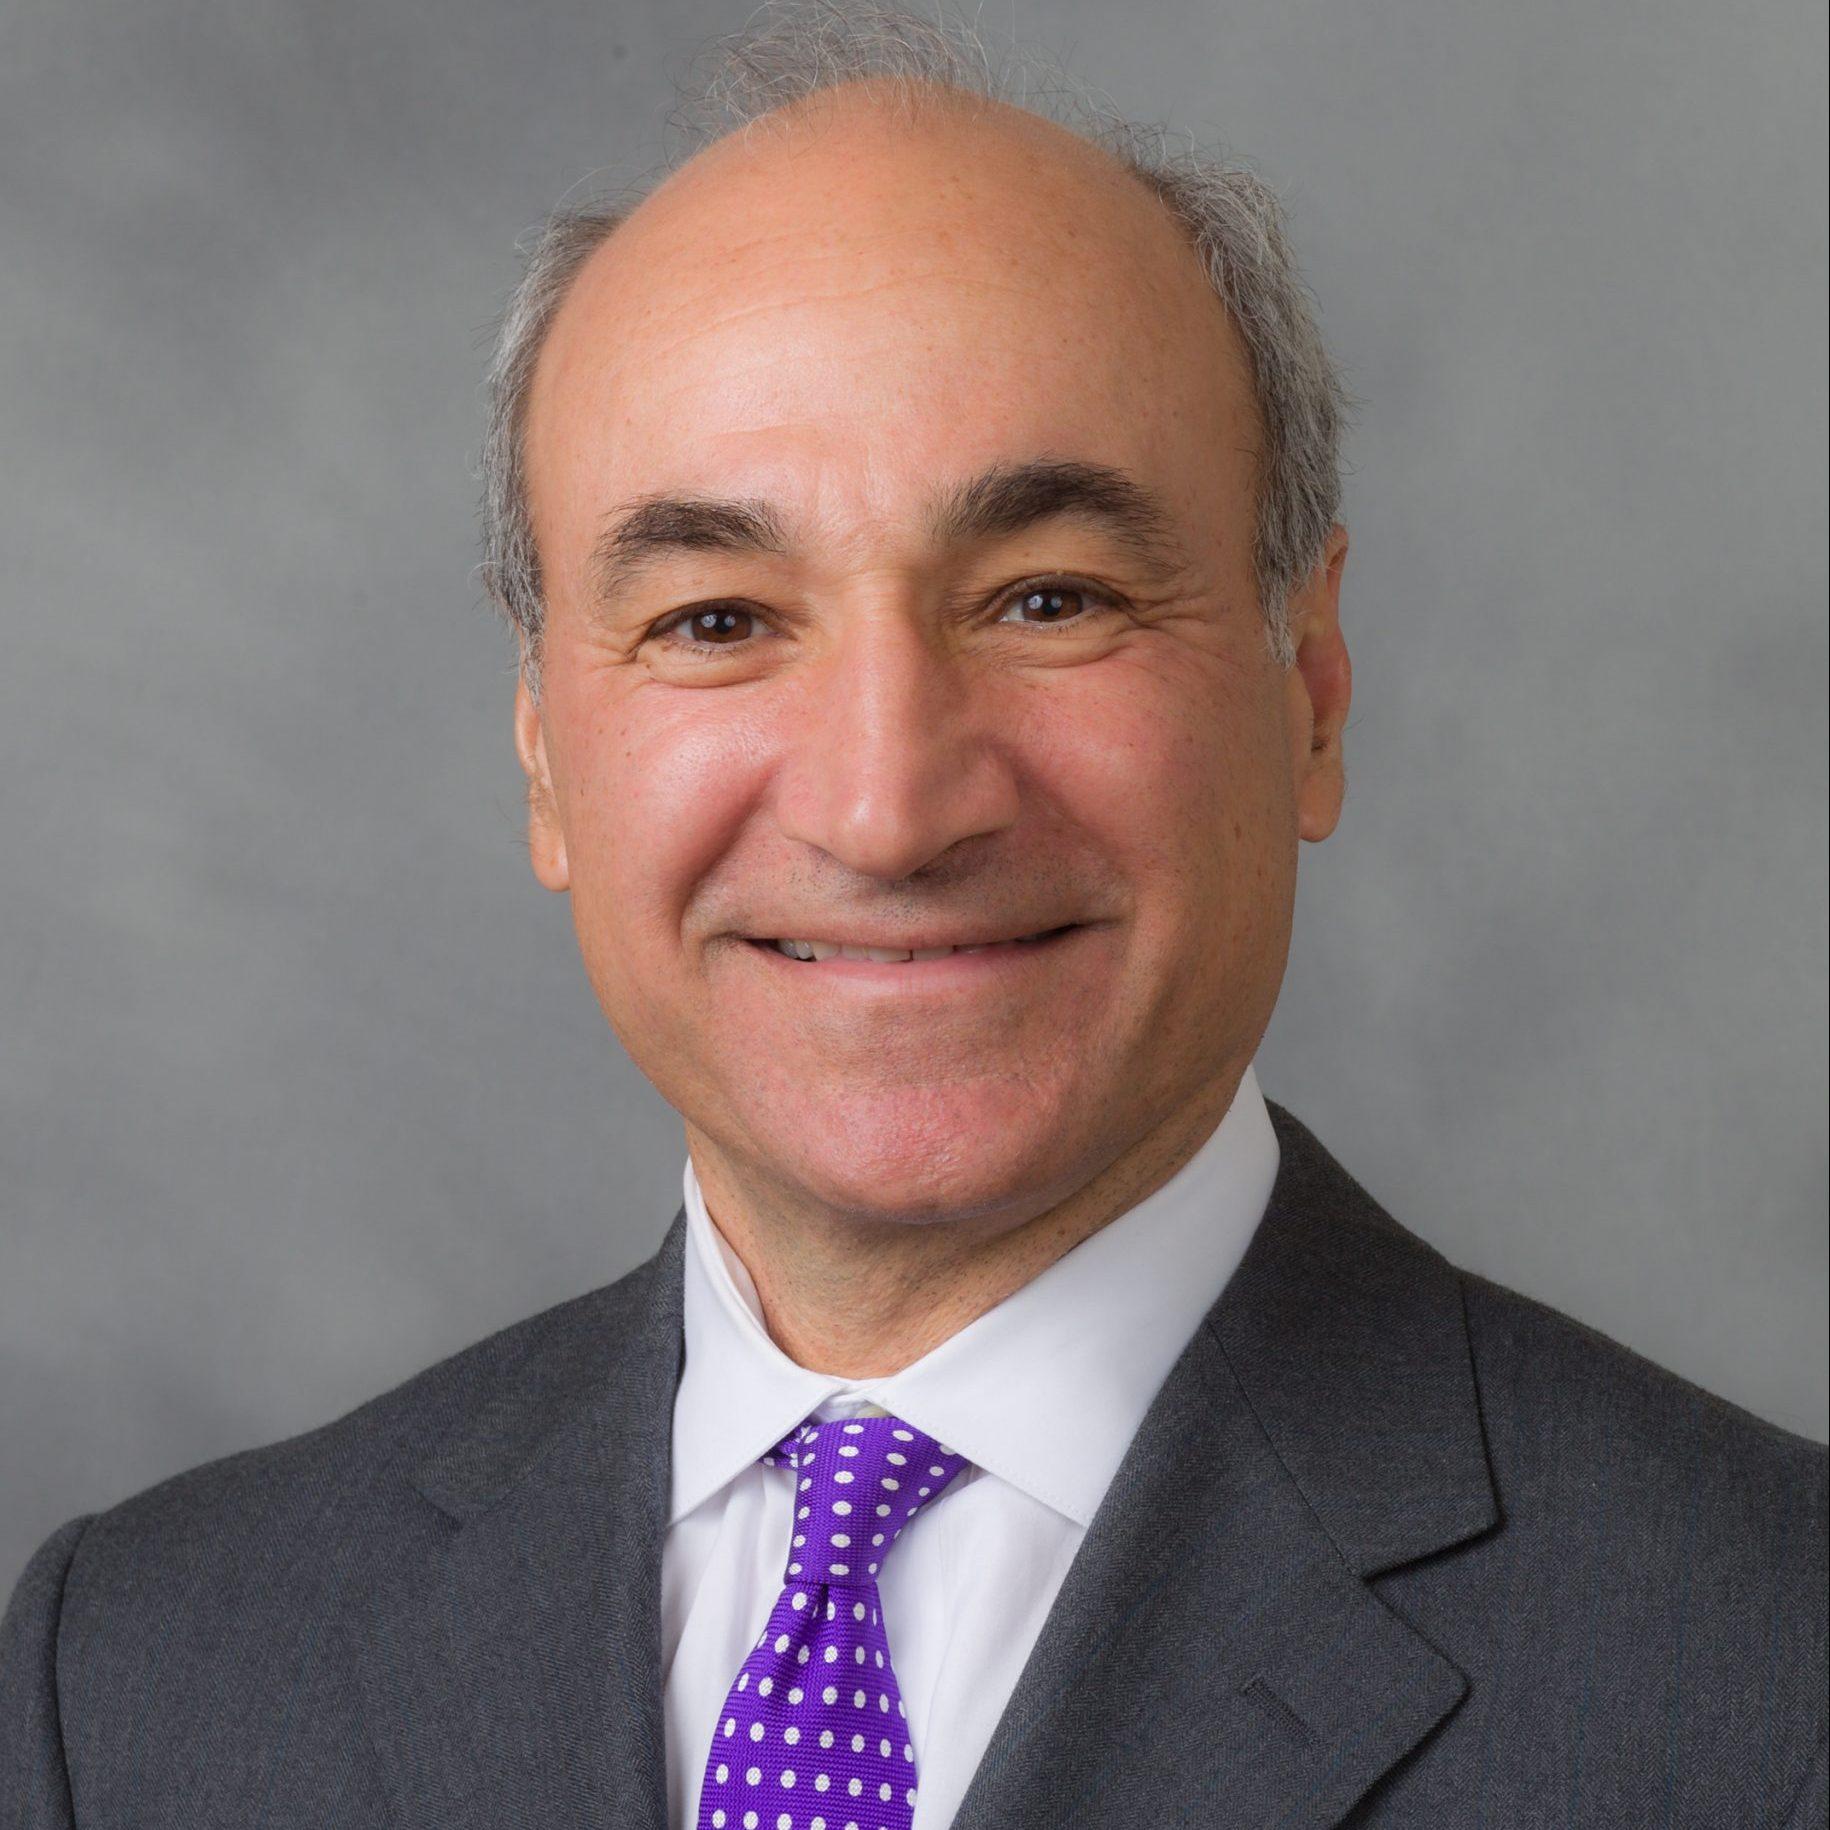 Mike Selverian, Private Investor